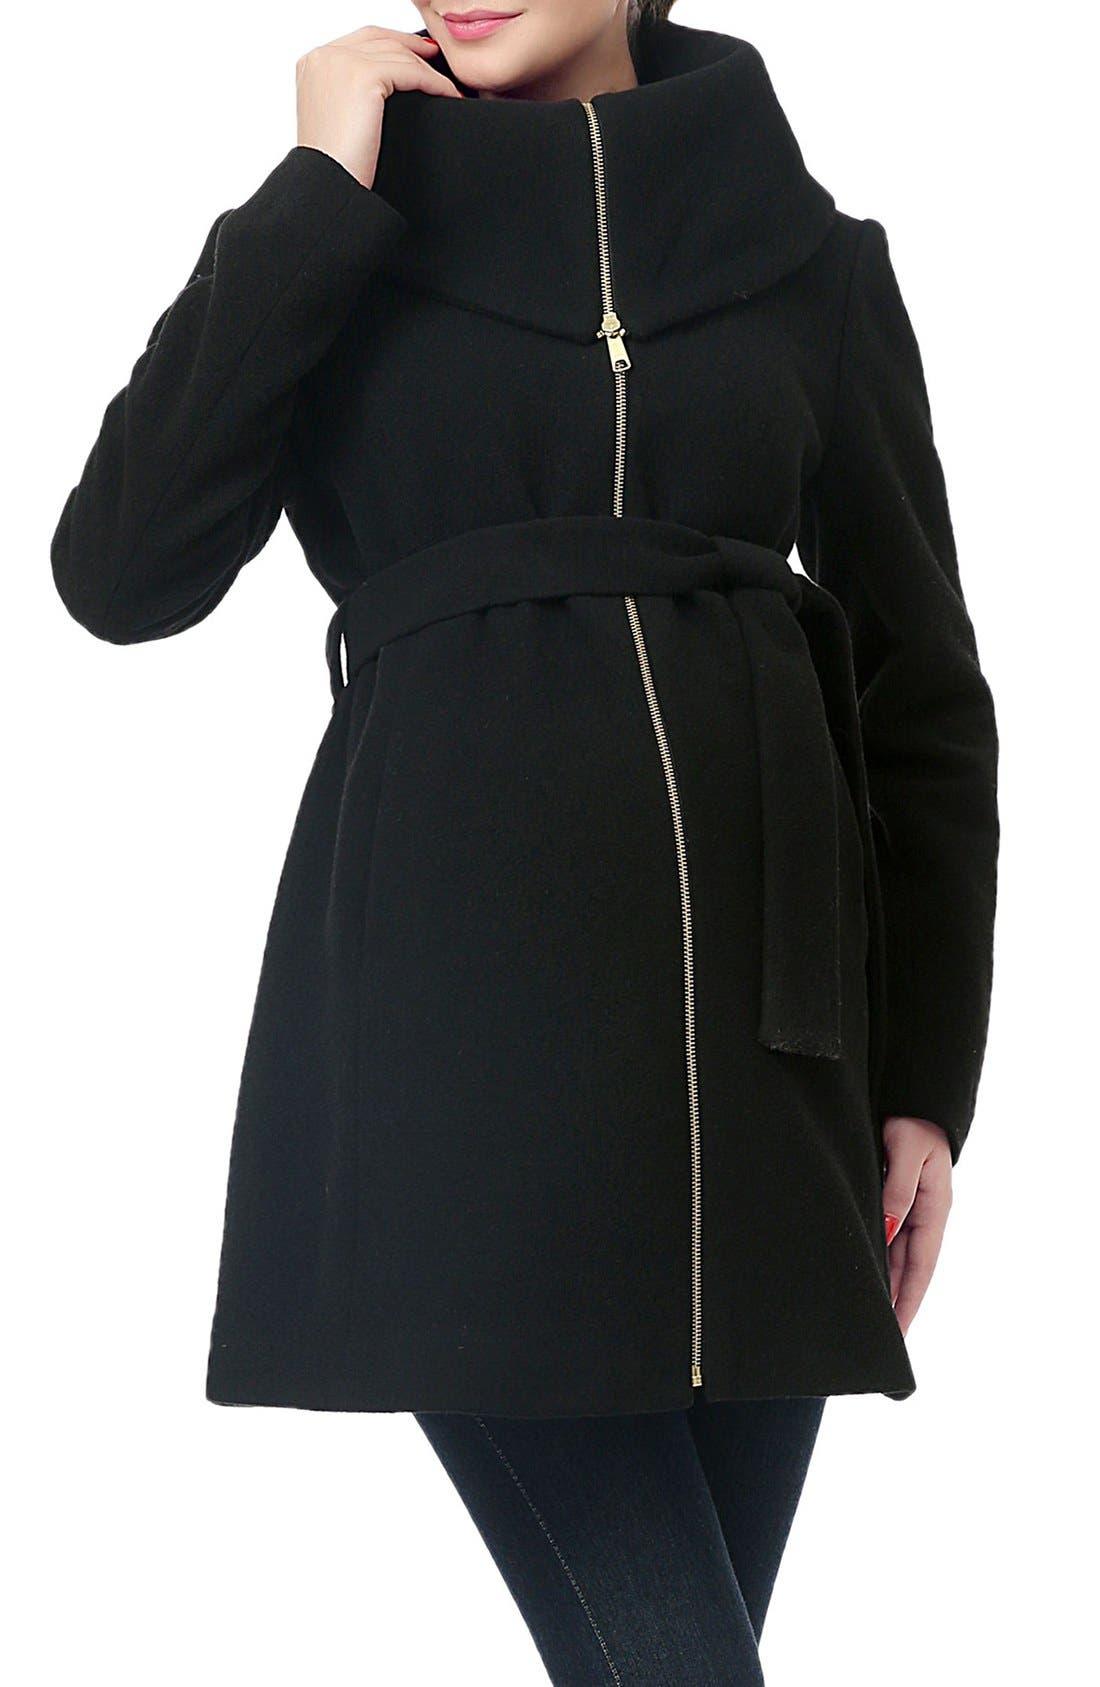 'Mia' High Collar Maternity Coat,                             Main thumbnail 1, color,                             BLACK